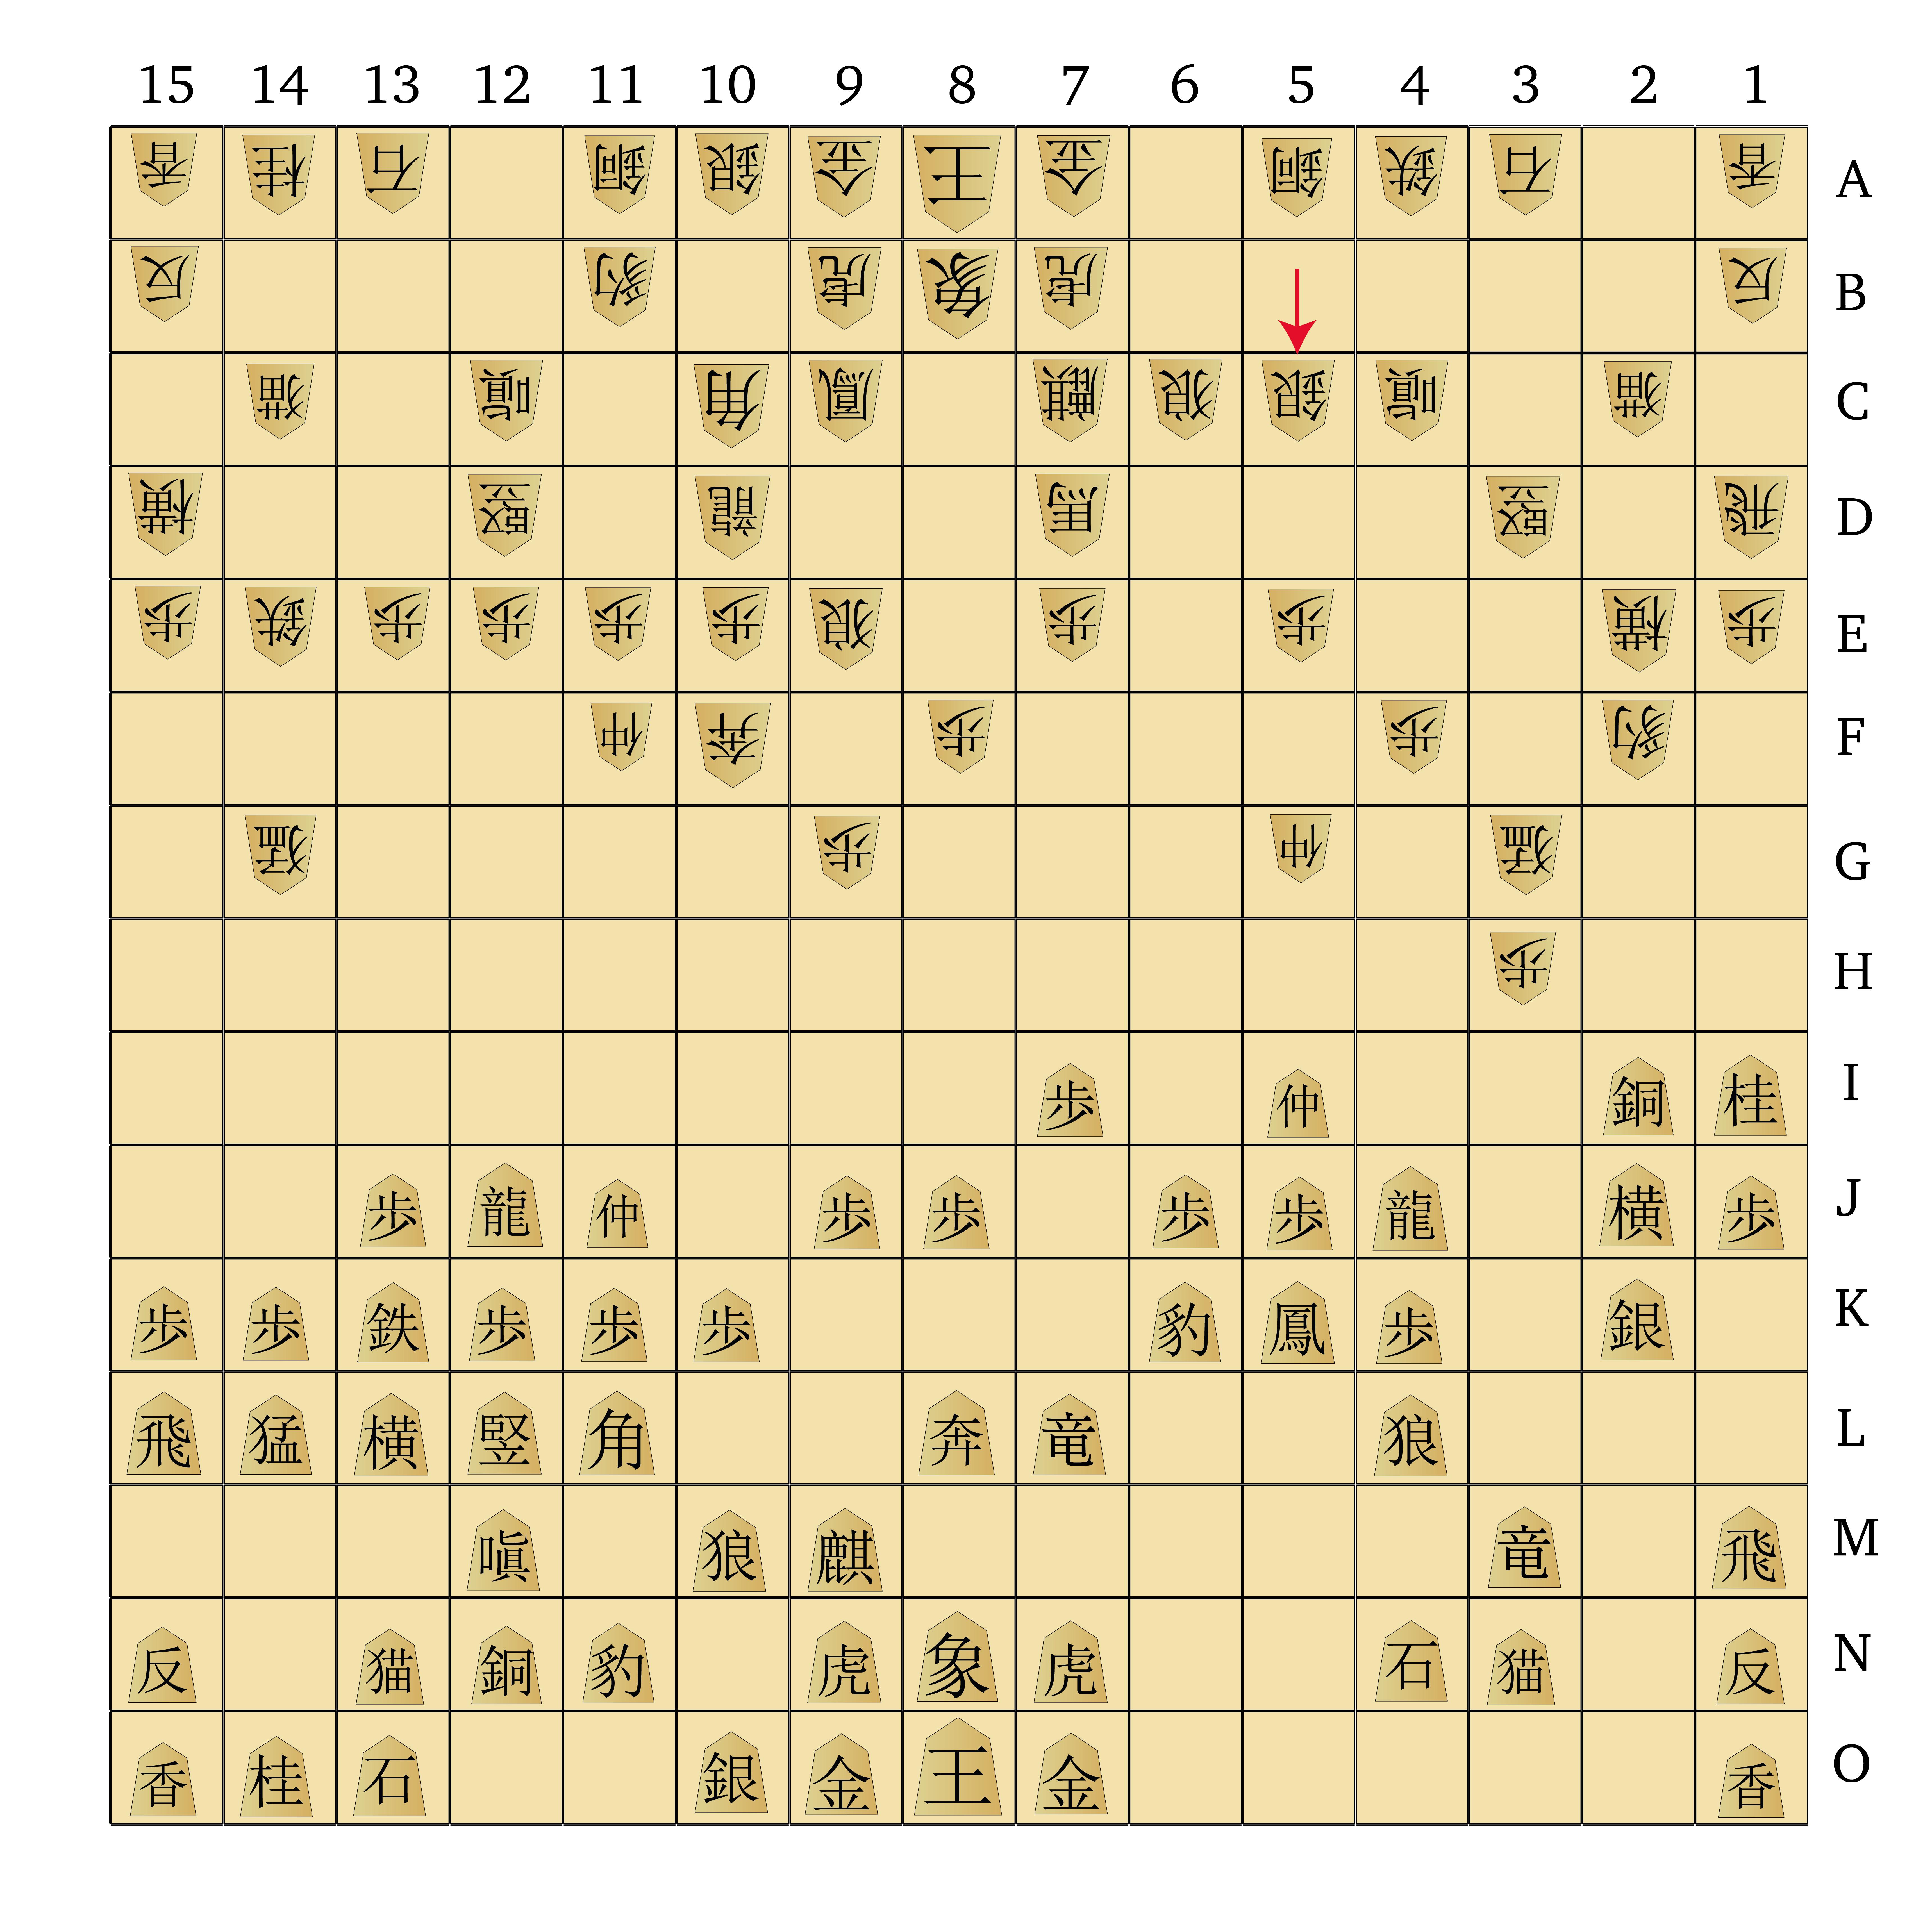 Dai Shogi 420 -- Move 150-01